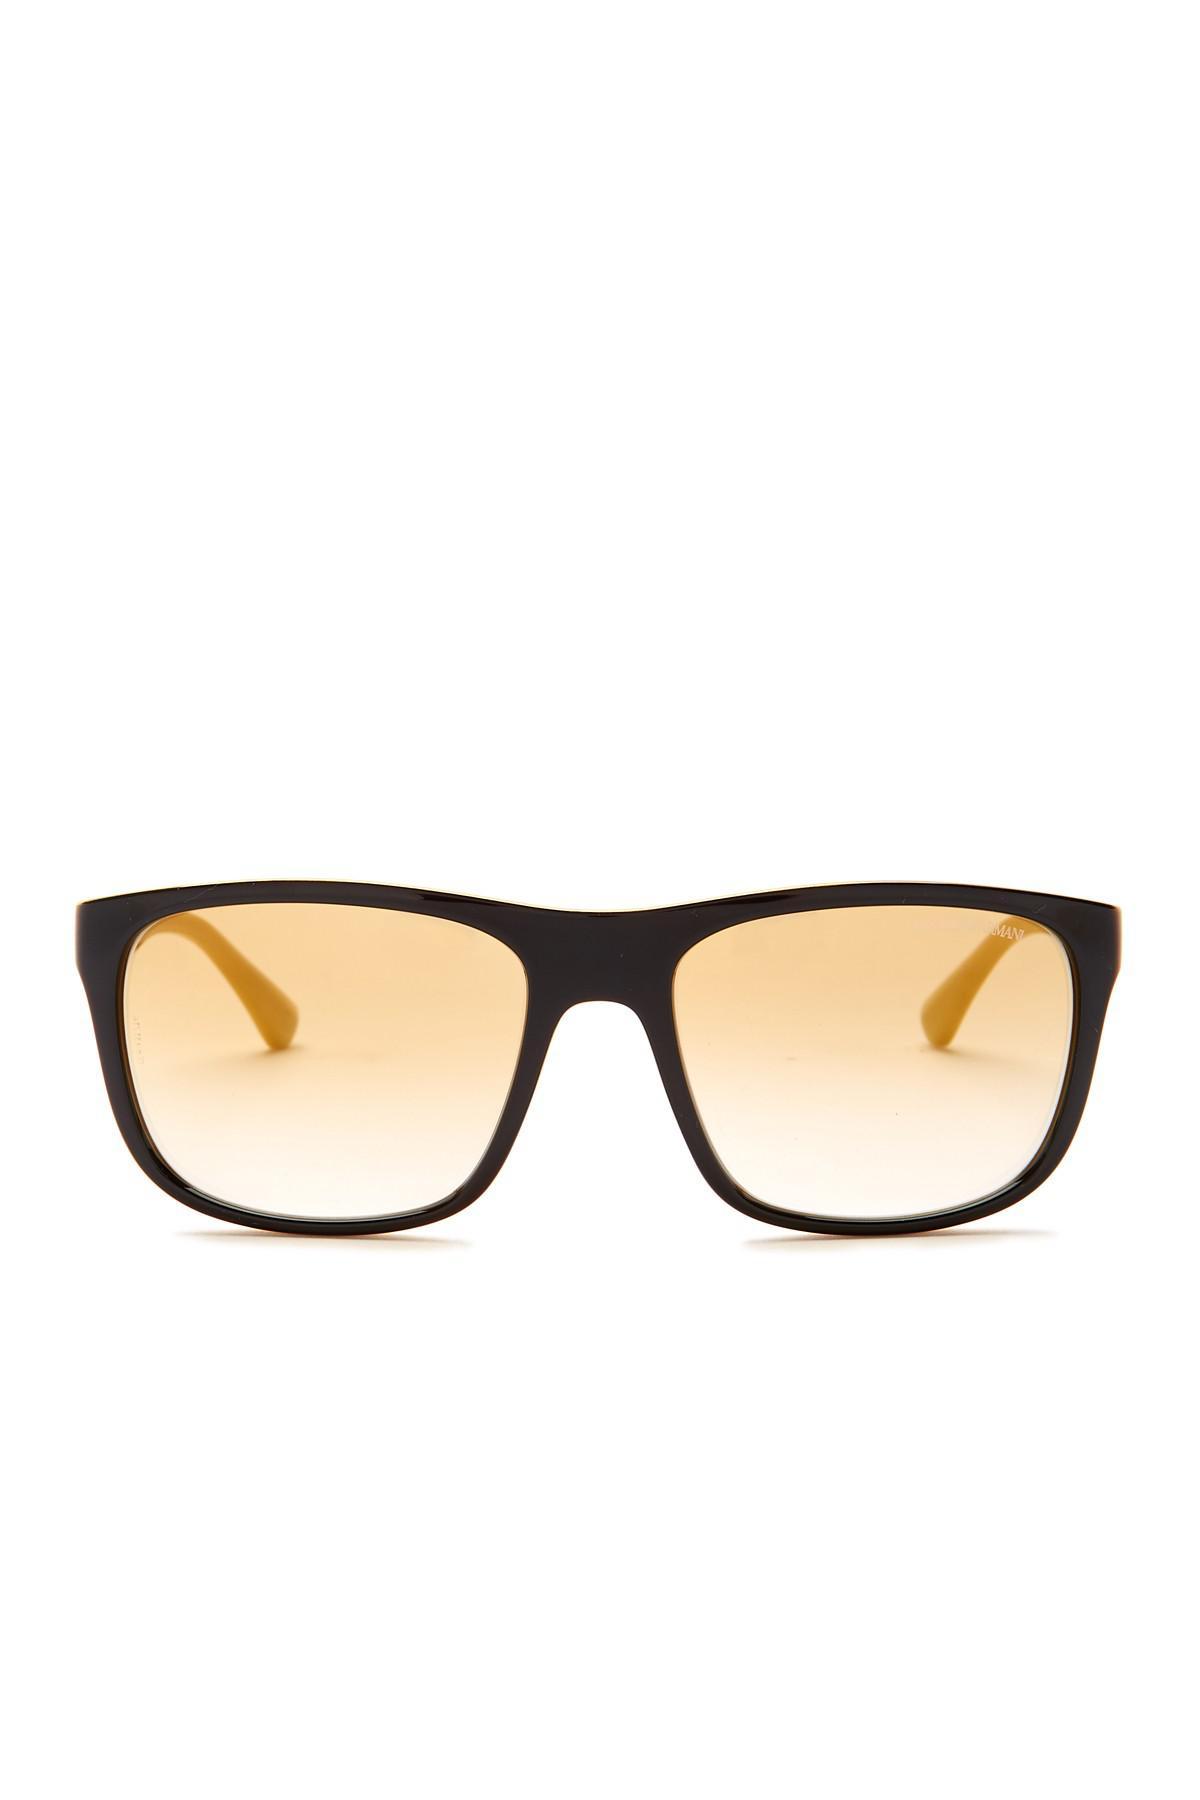 62f80239def0 Lyst - Emporio Armani 56mm Wayfarer Acetate Frame Sunglasses in ...